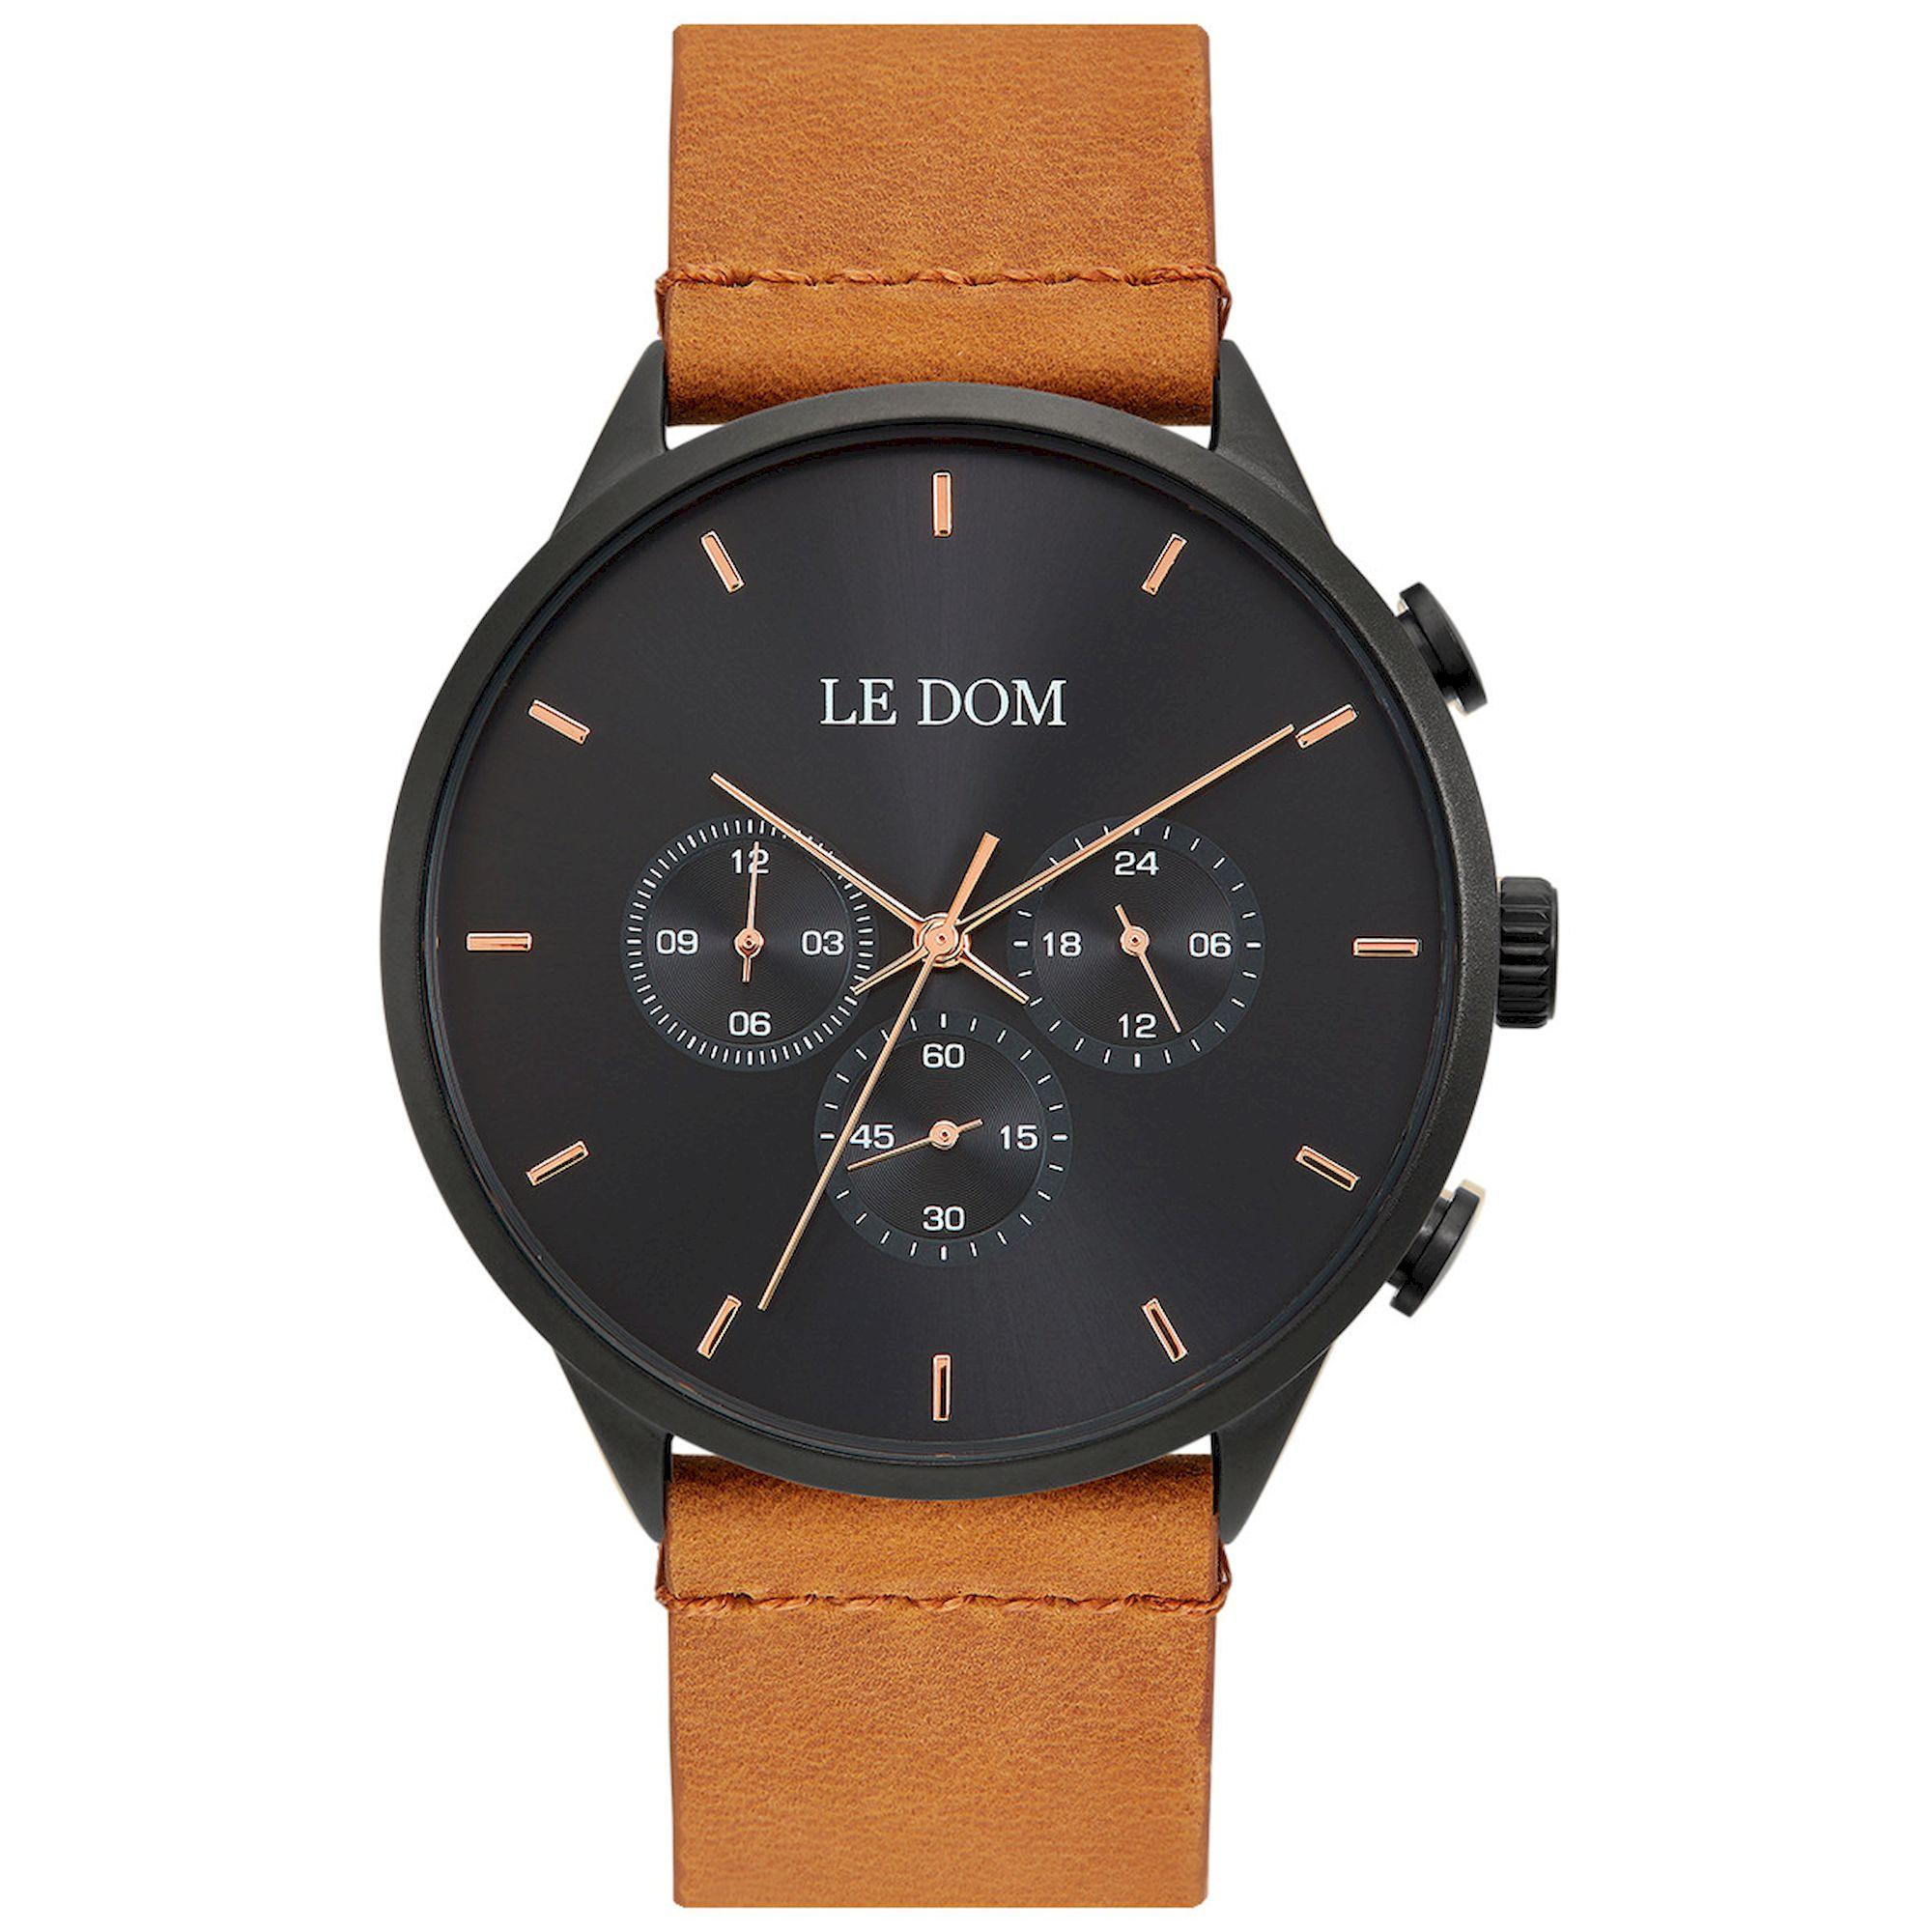 LE DOM Principal Καφέ Λουράκι LD.1436-9, le dom, ανδρικό ρολόι, ρολόγια, Δωρεάν έξοδα αποστολής, Άμεση ΔΙαθεσιμότητα, Le Dom Ρολόγια